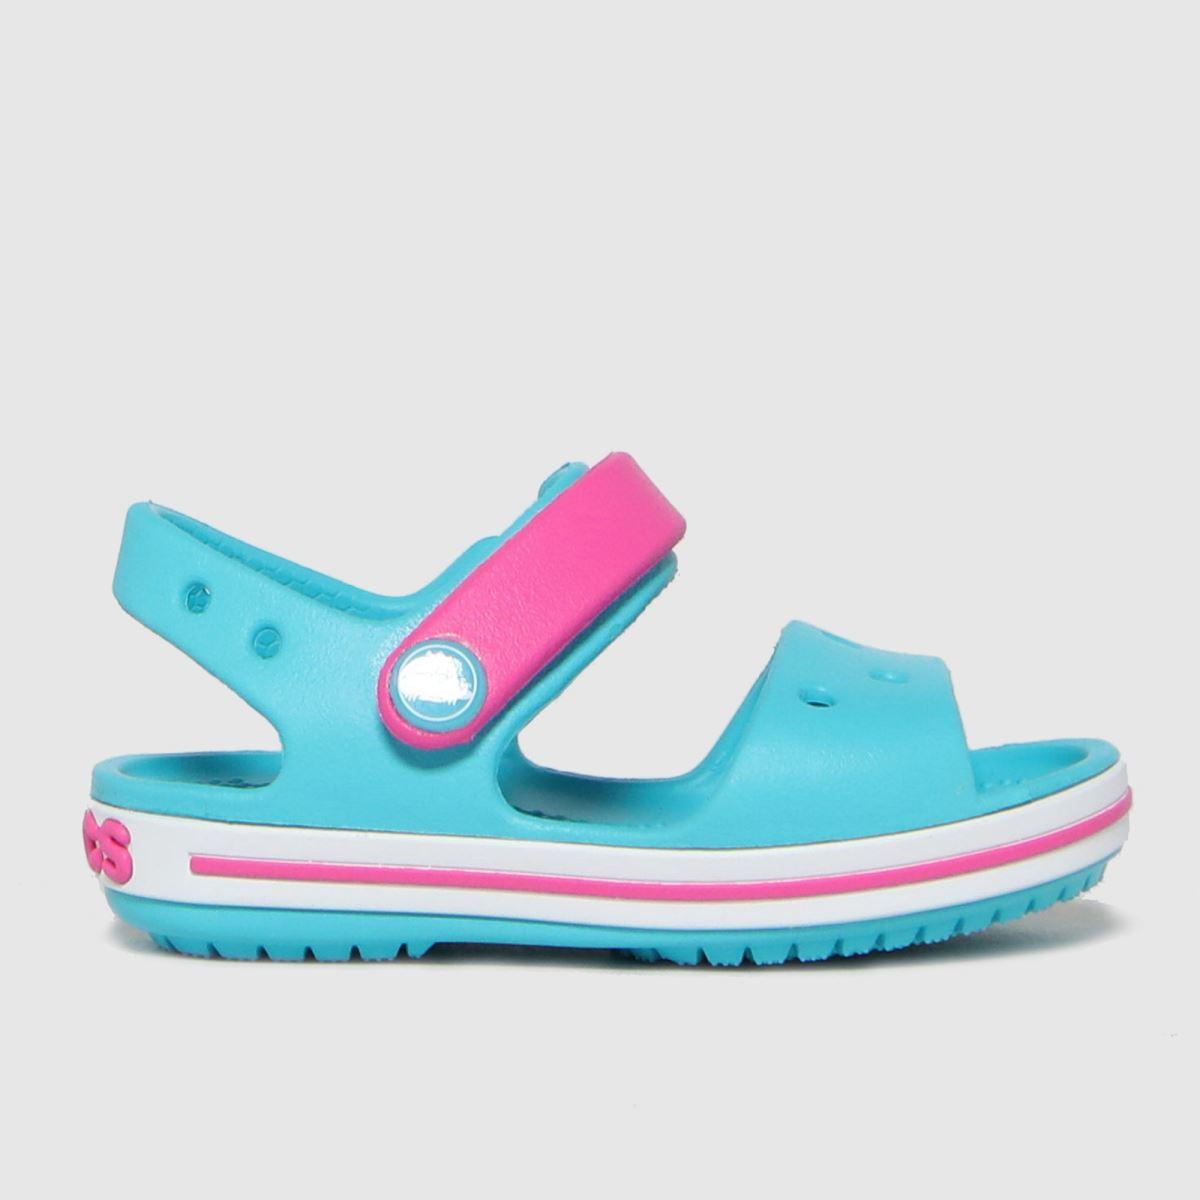 Crocs Turquoise Crocband SANDAL Toddler